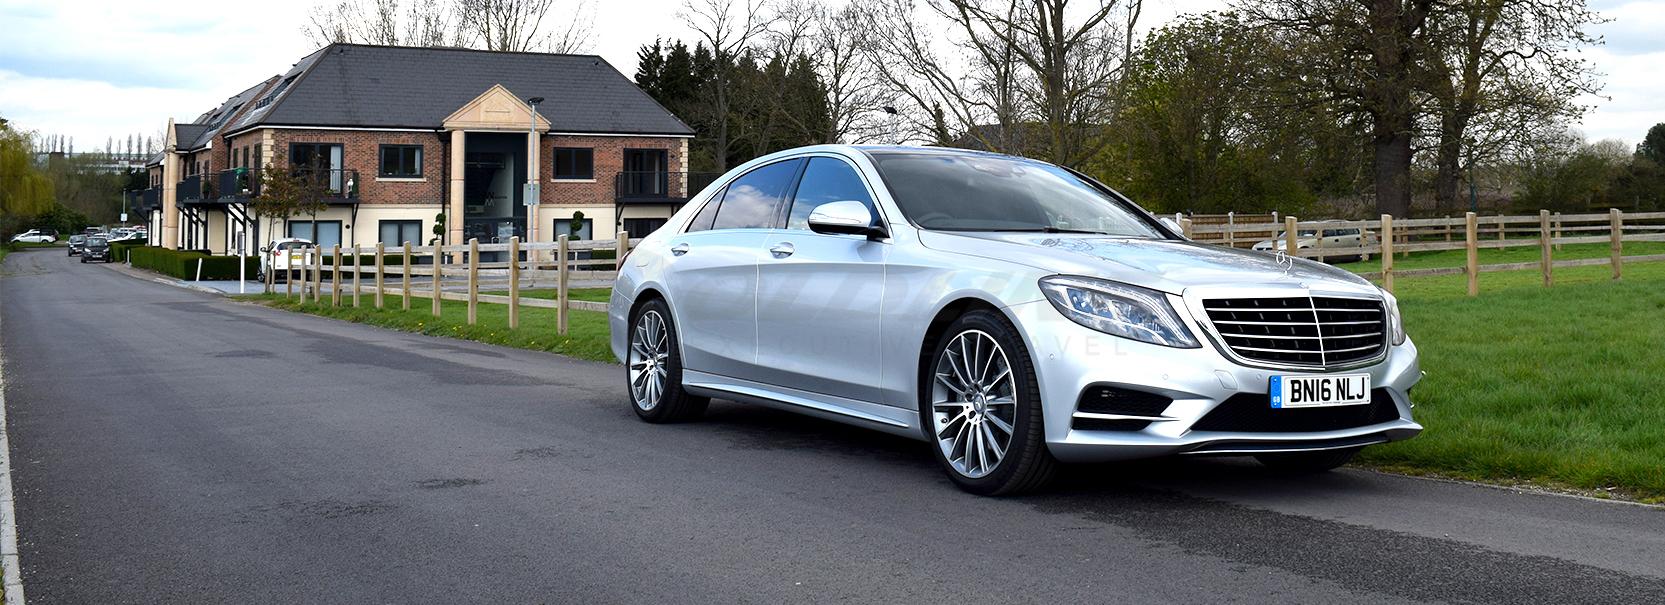 Mercedes s class hire london cheap luxury vehicle hire london for Cheap mercedes benz rental